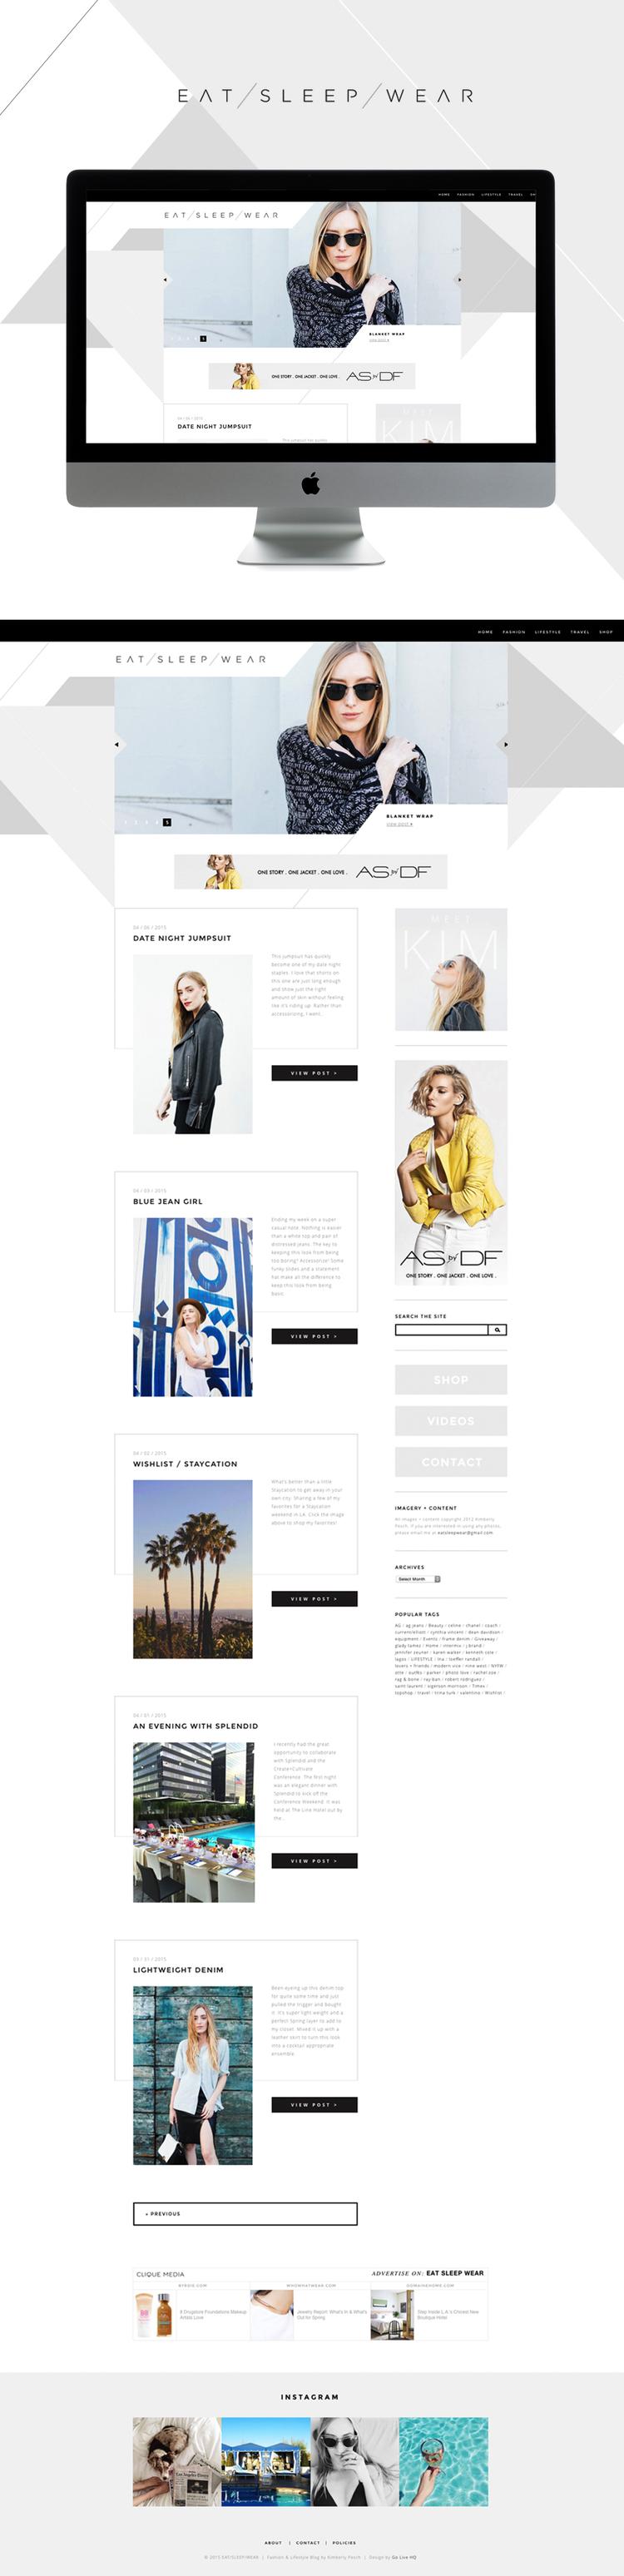 Eat Sleep Wear Is Live With Images Blog Website Design Fun Website Design